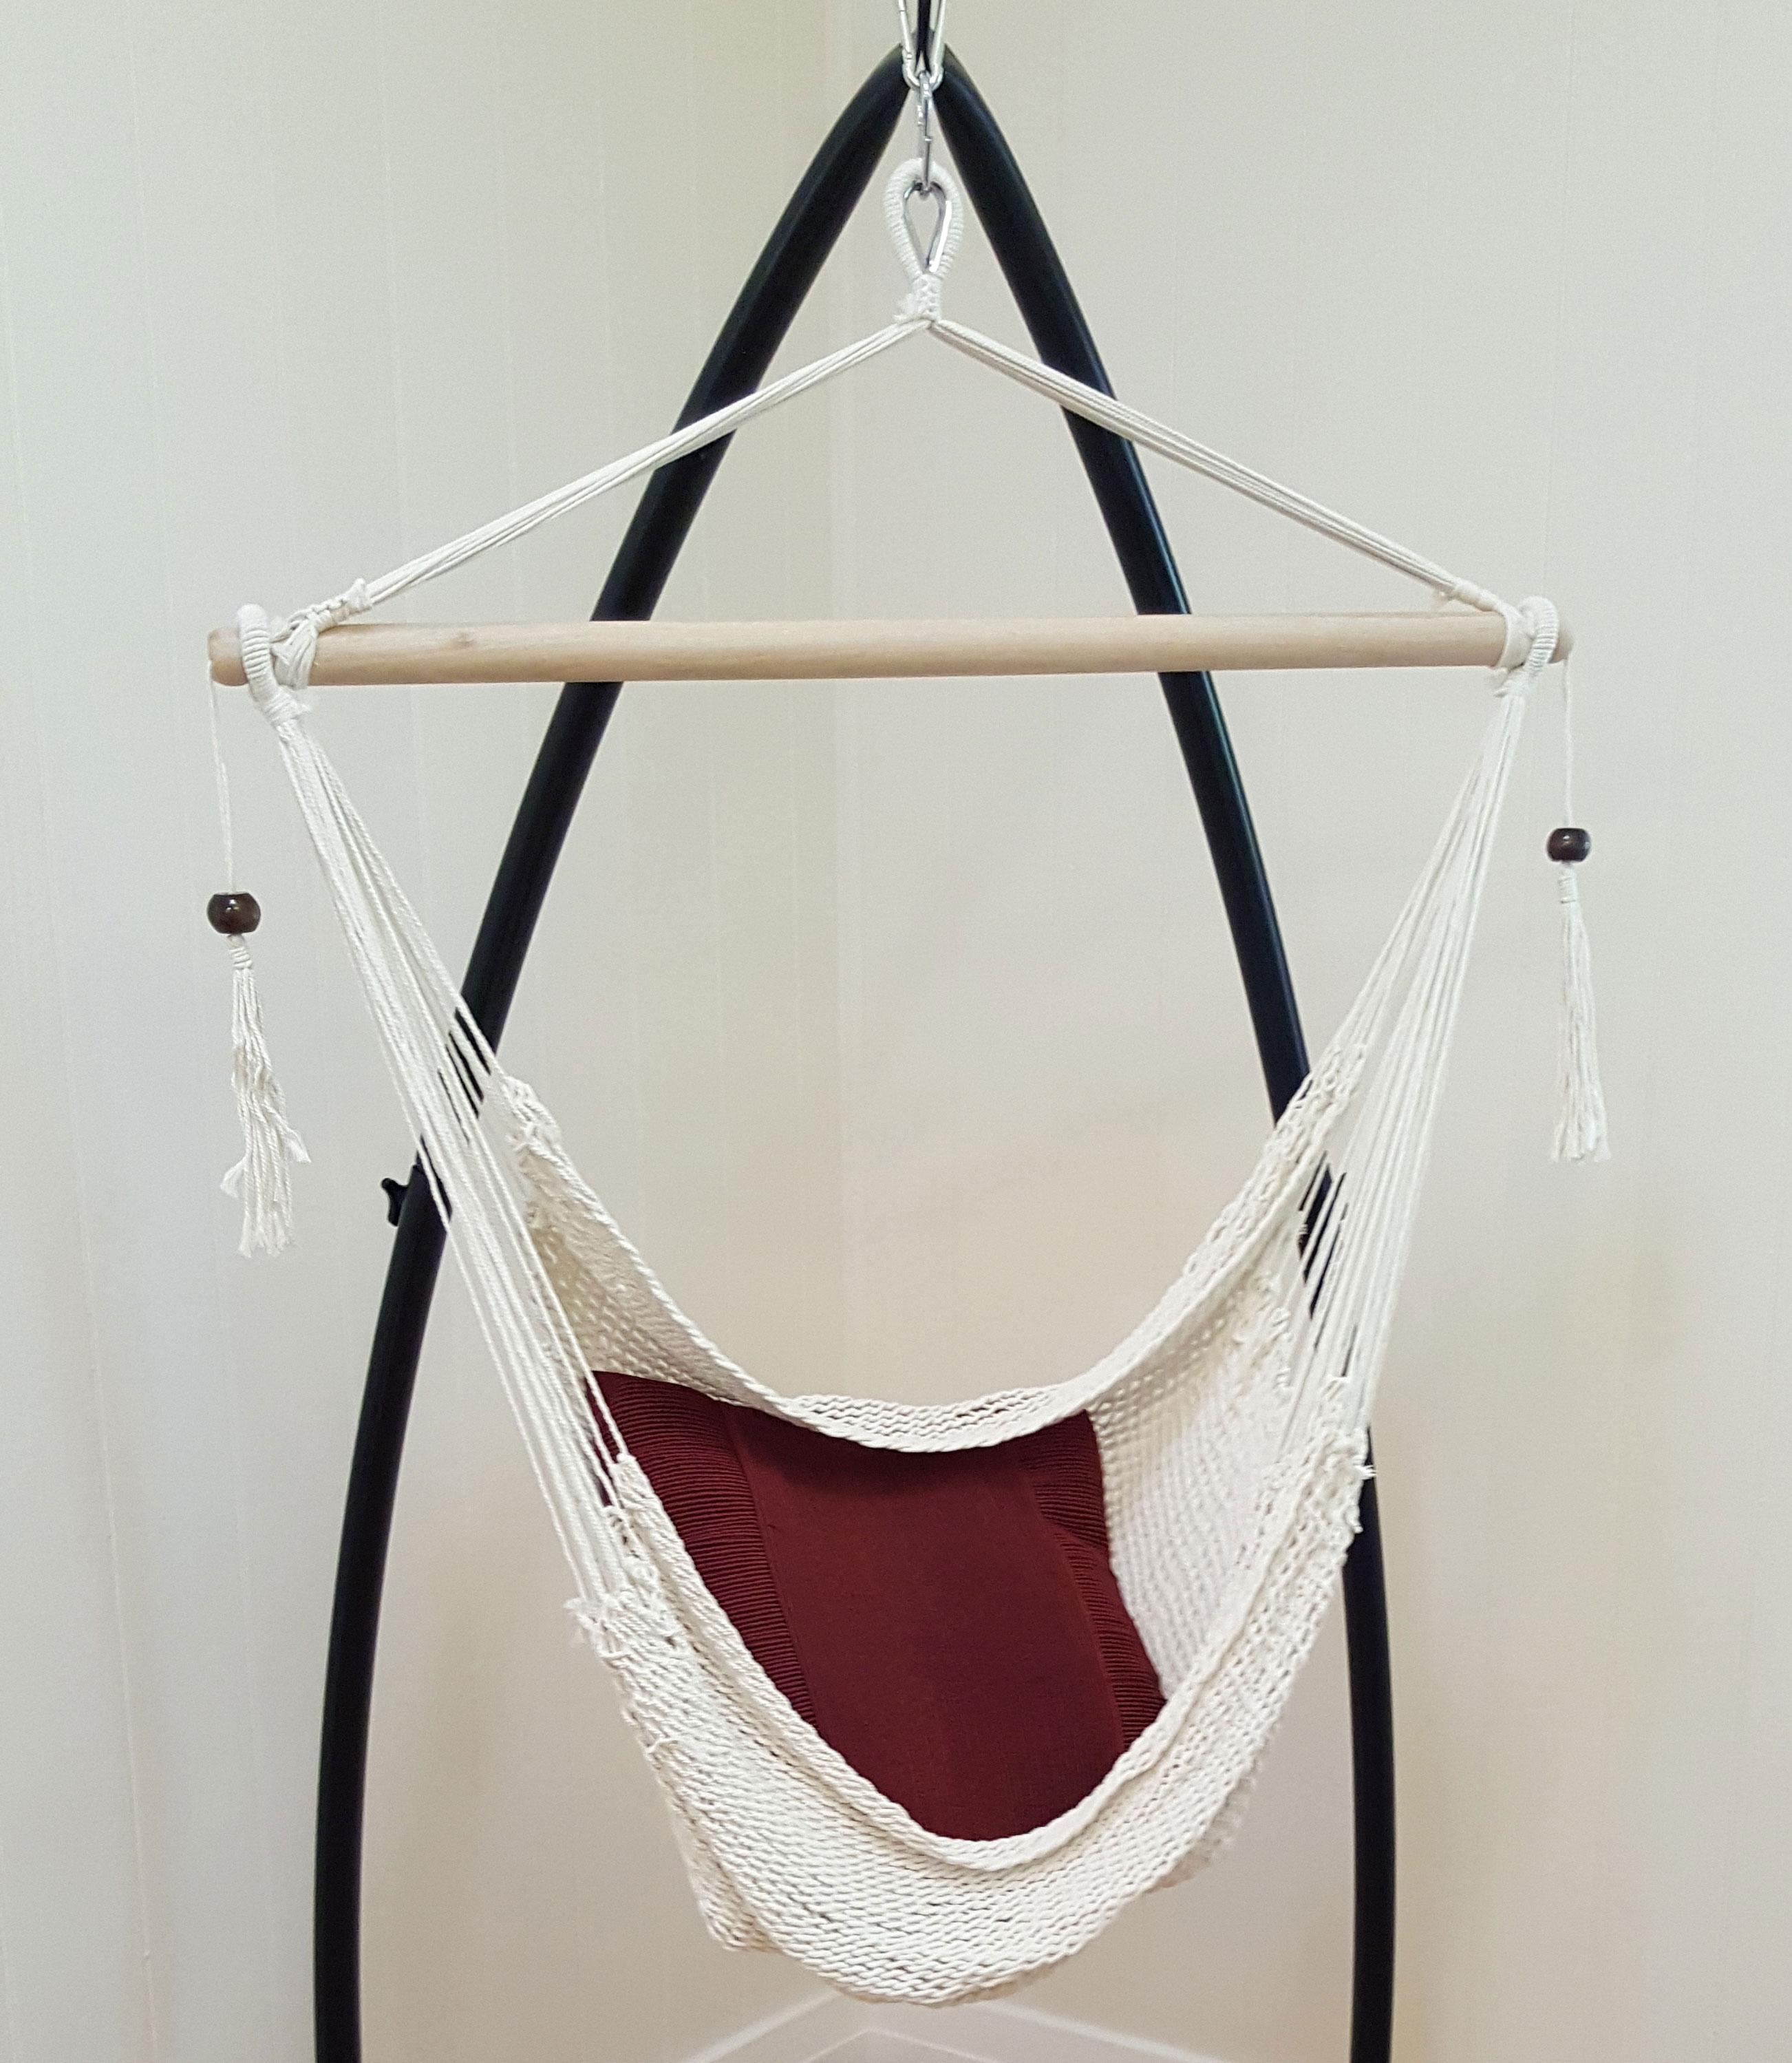 hanging chair bolt skyline furniture slipper rope hammock with tassels 43 free kit